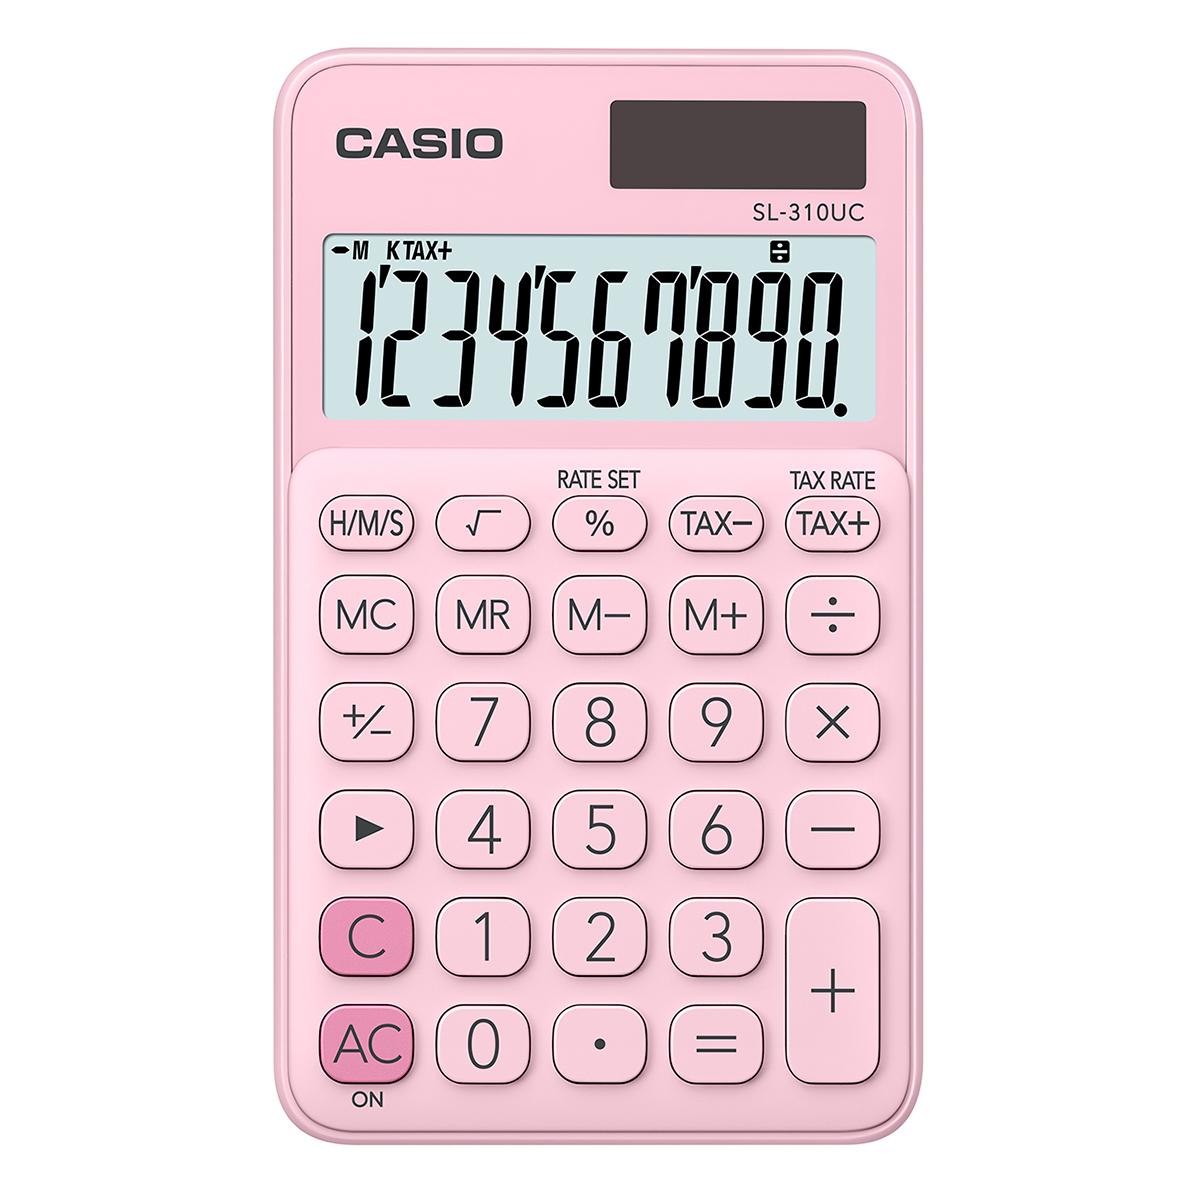 Casio SL-310UC Handheld Calculator Pink